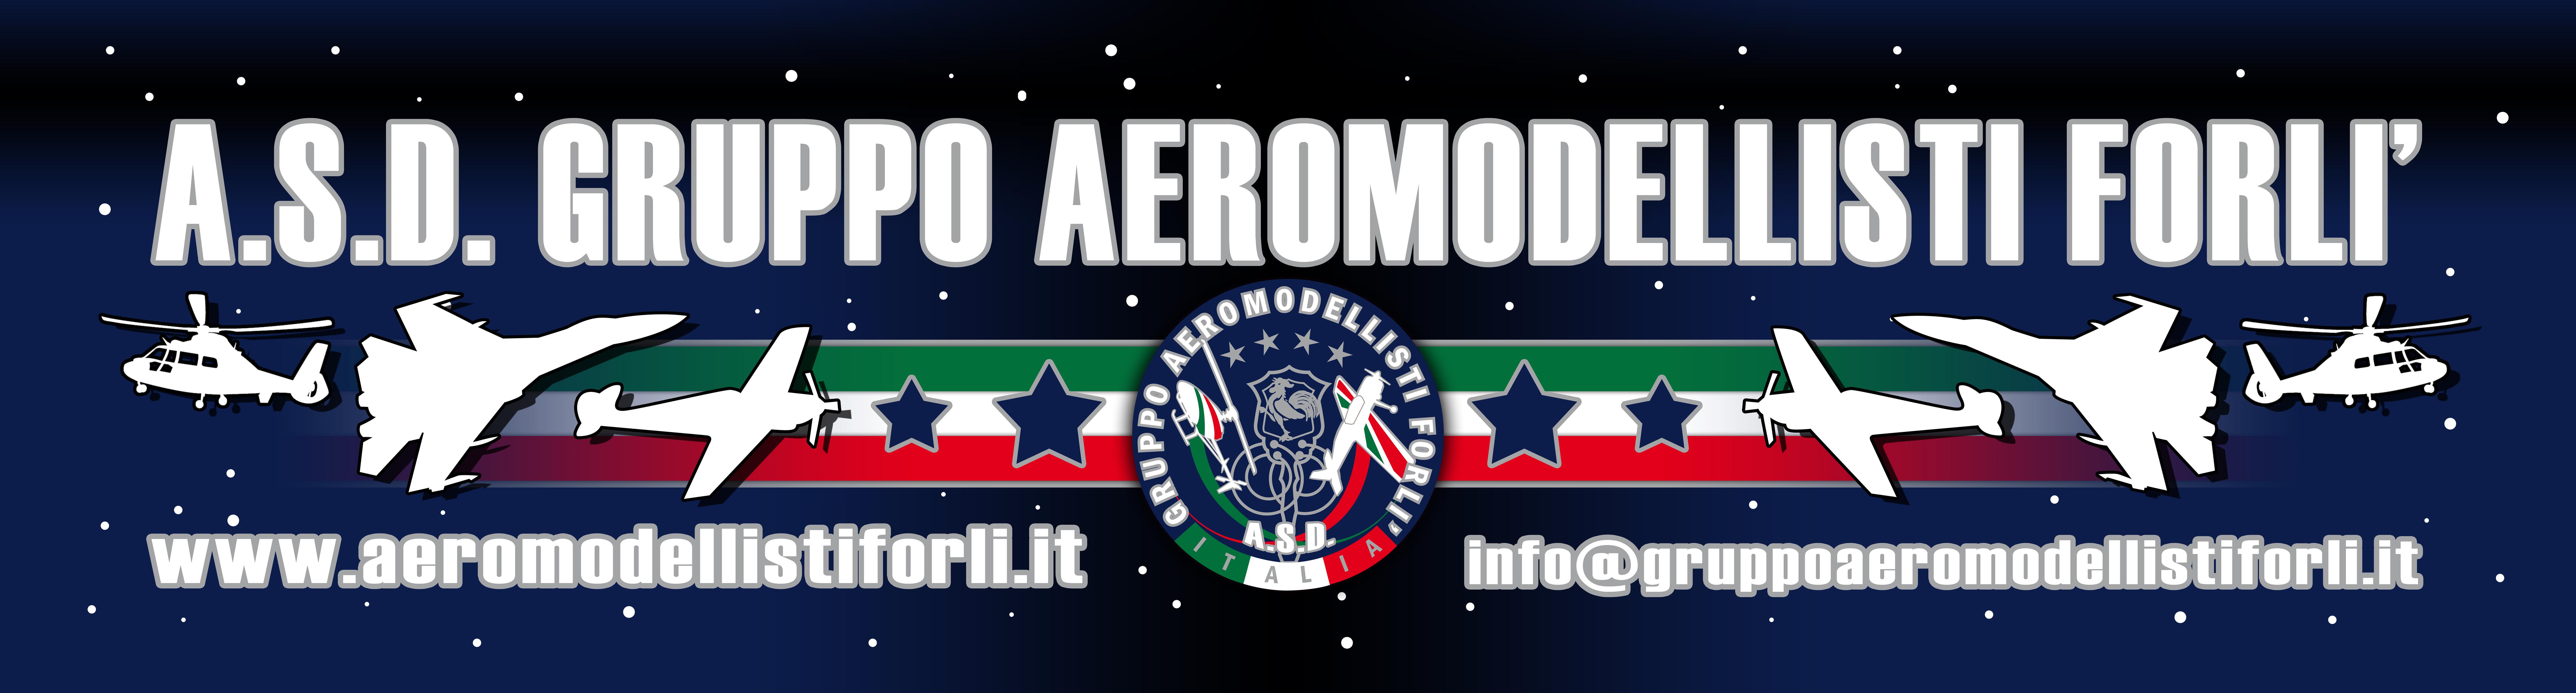 Gruppo Aeromodellisti Forli